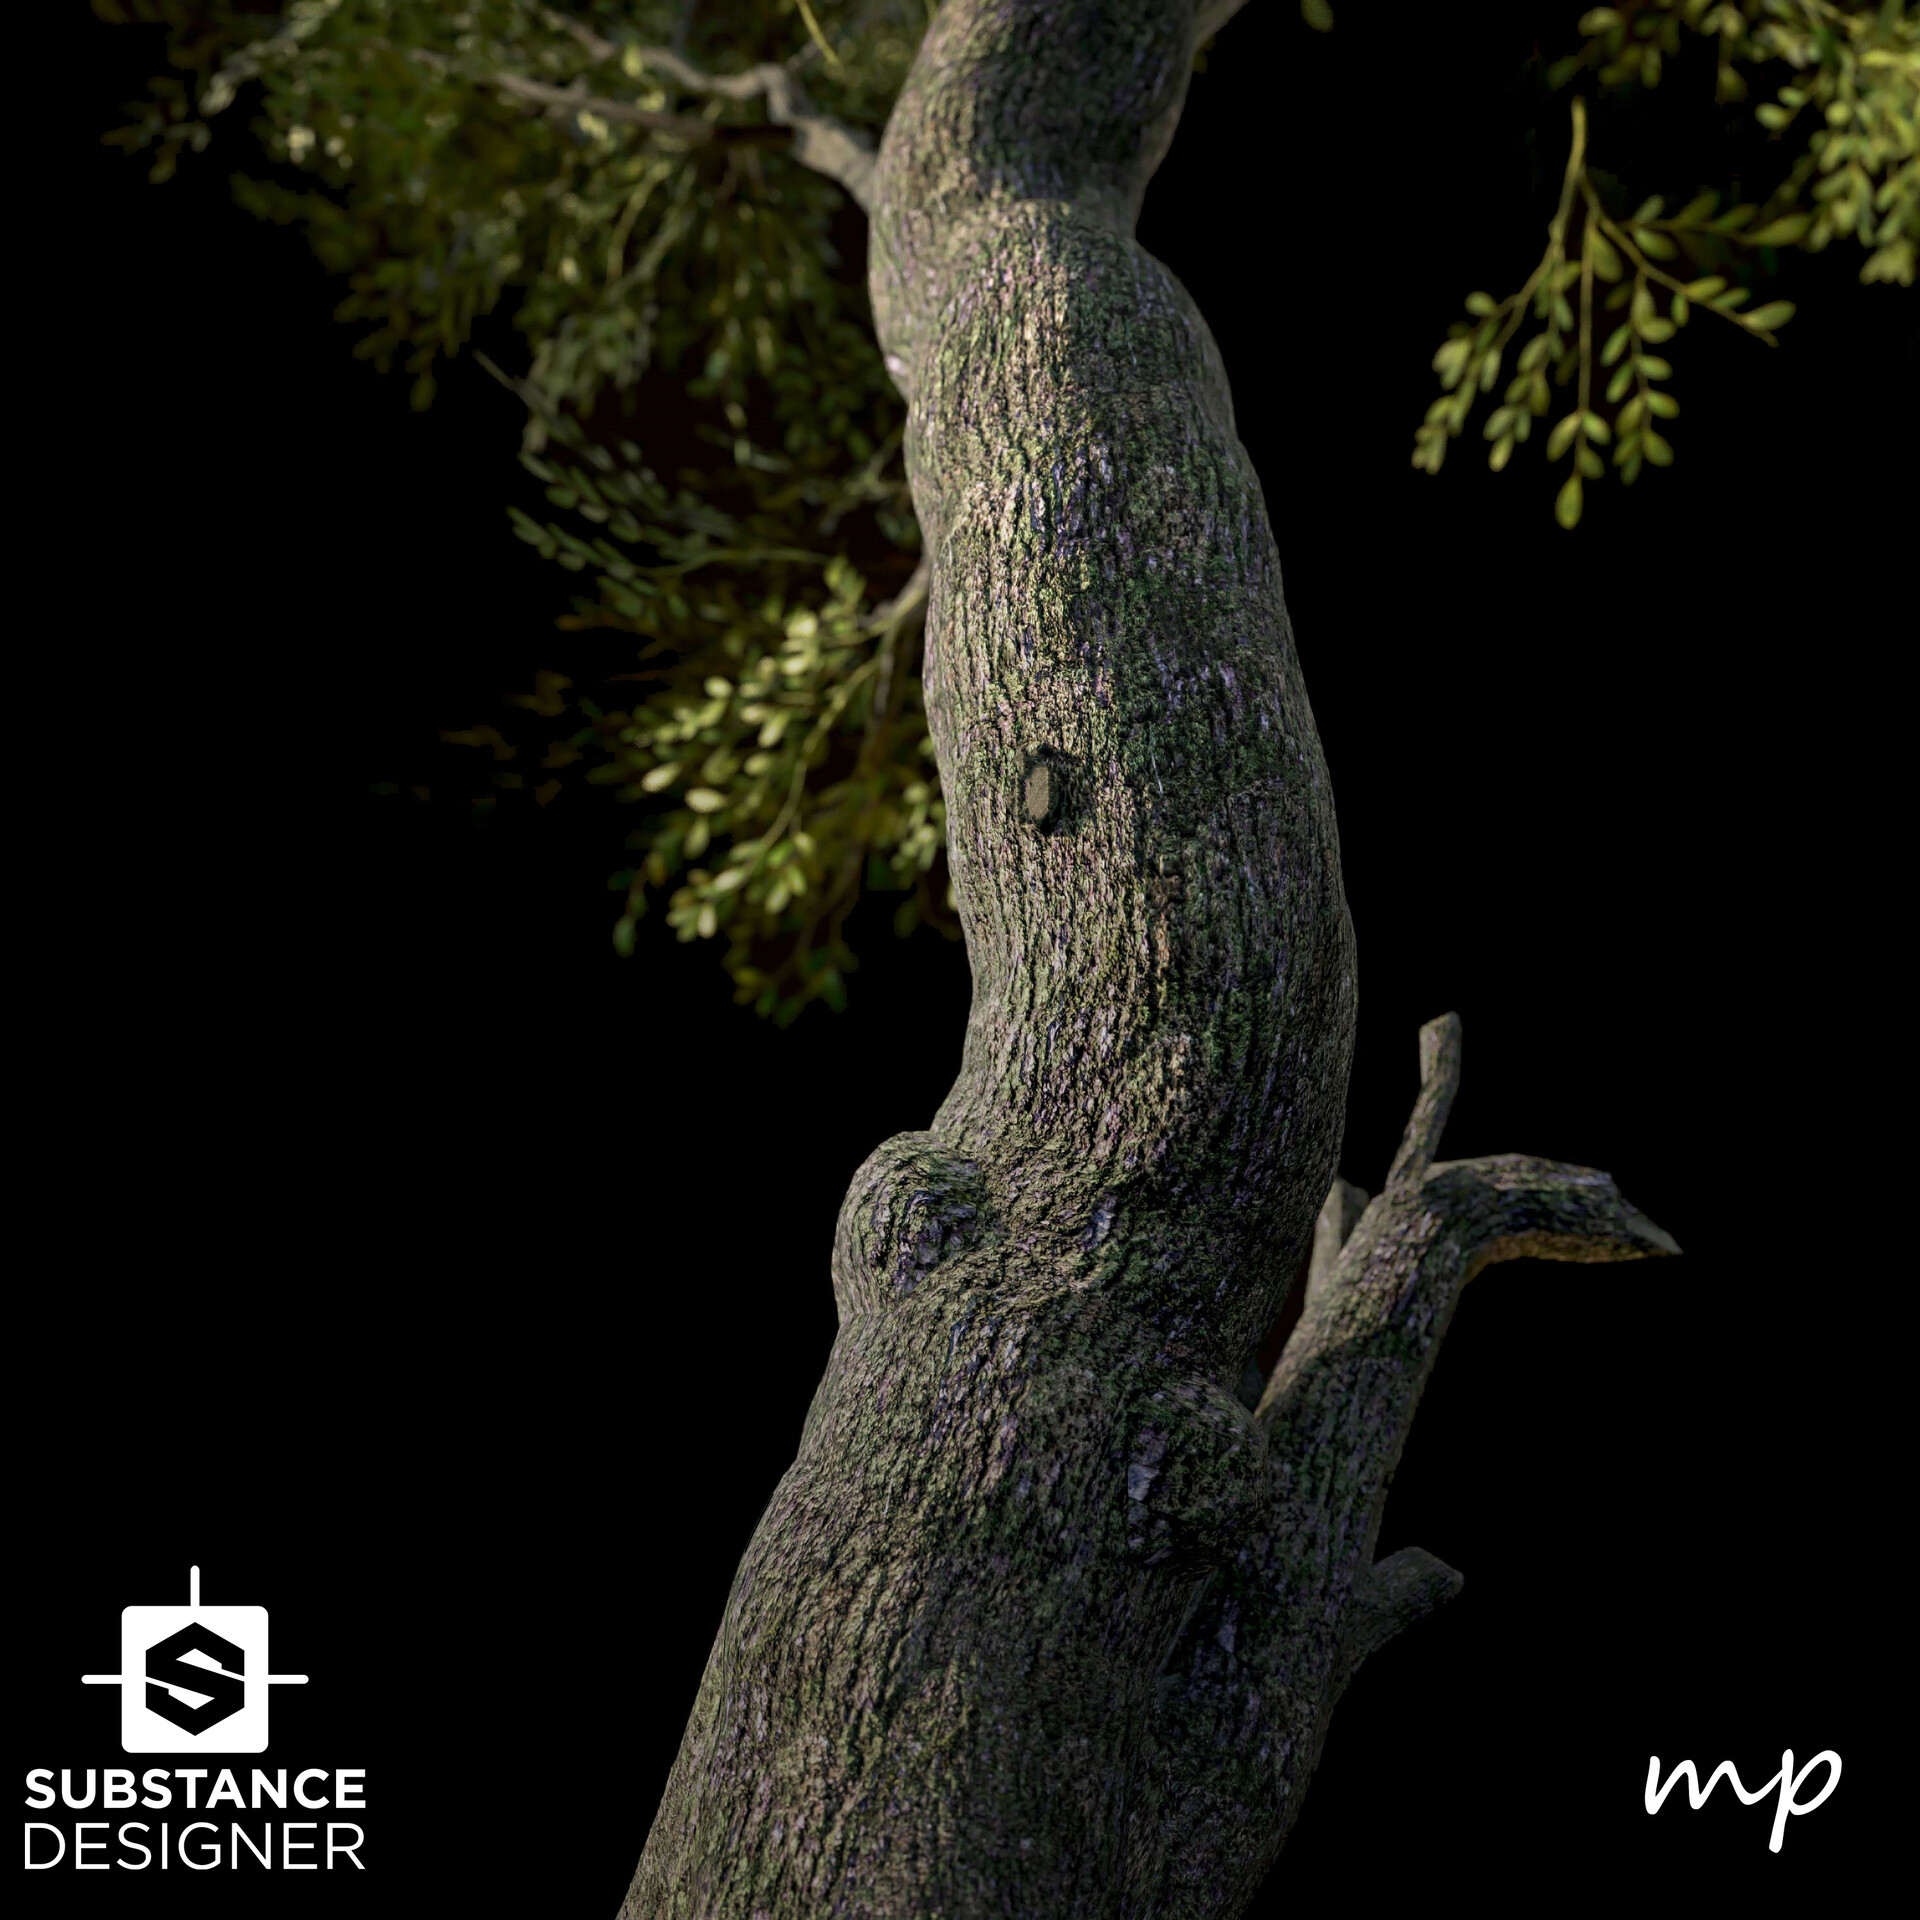 Tree Bark preview Preset for substance designer. Nice for previewing tiling/etc.